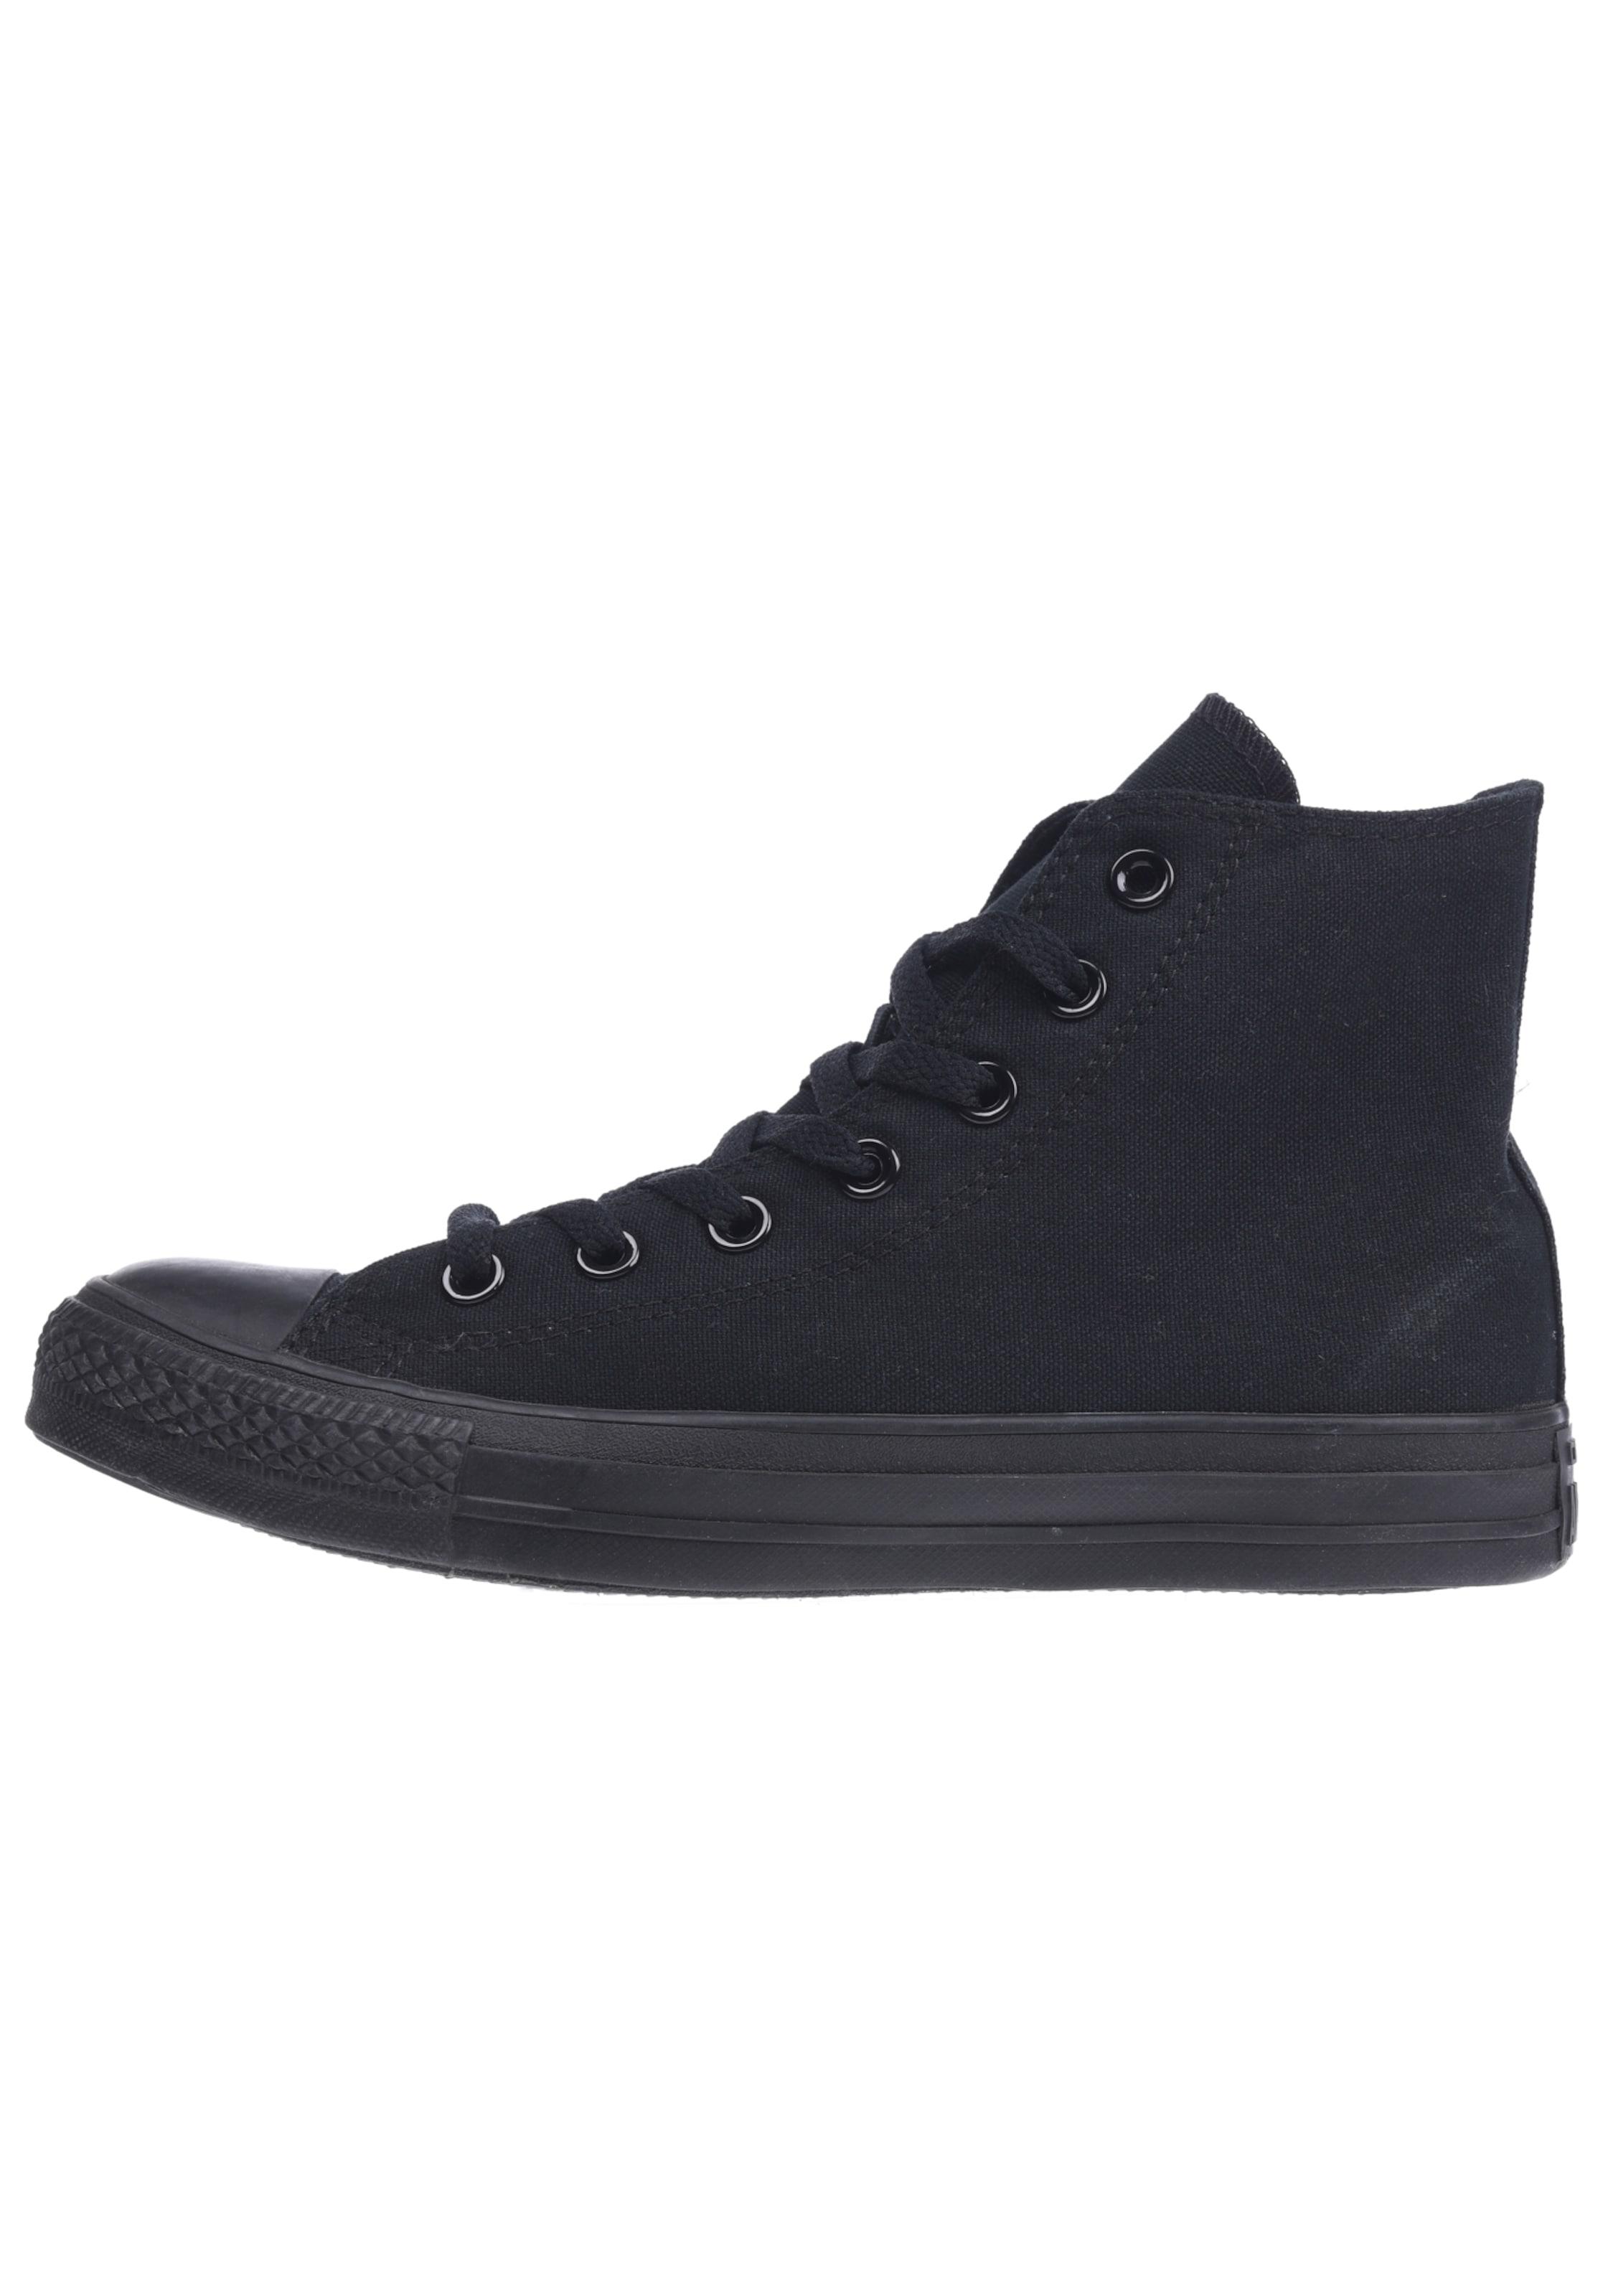 CONVERSE Sneaker Günstige und langlebige Schuhe